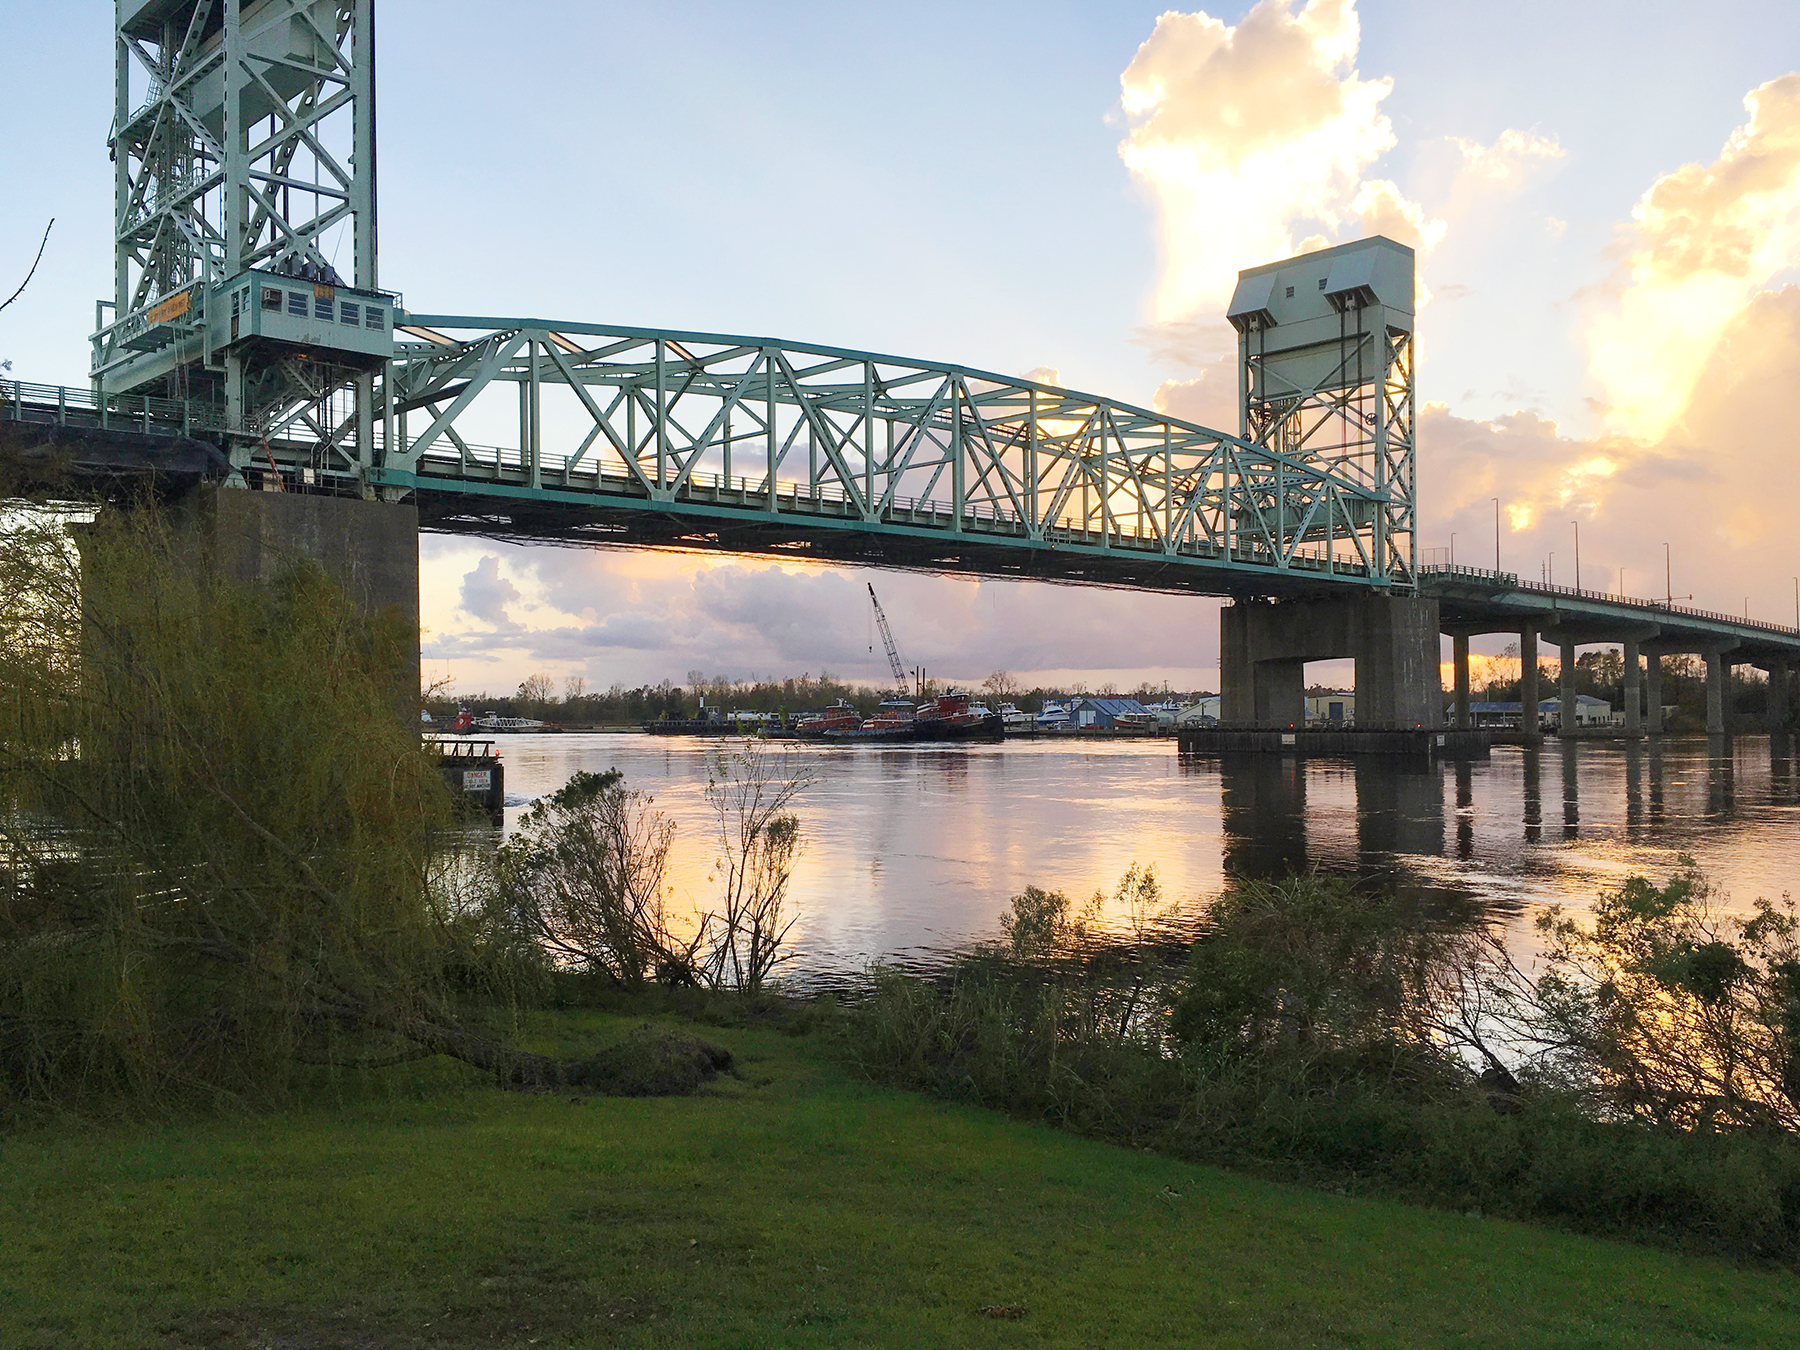 Cape Fear Memorial Bridge in Wilmington